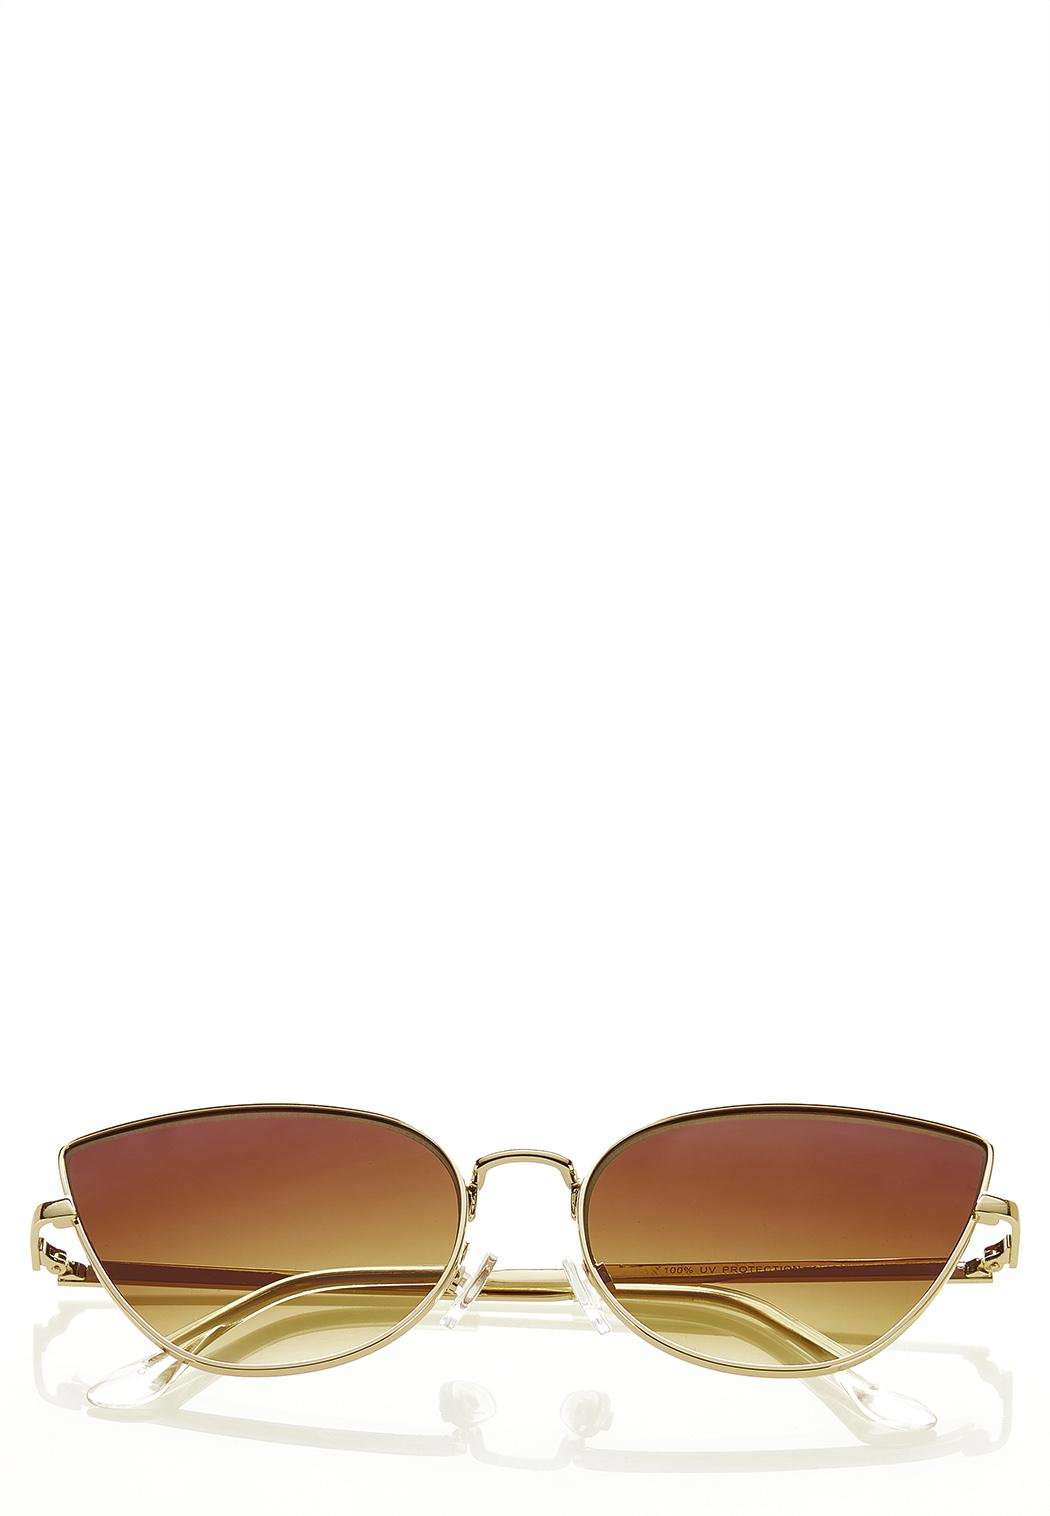 Gold Rim Cateye Sunglasses